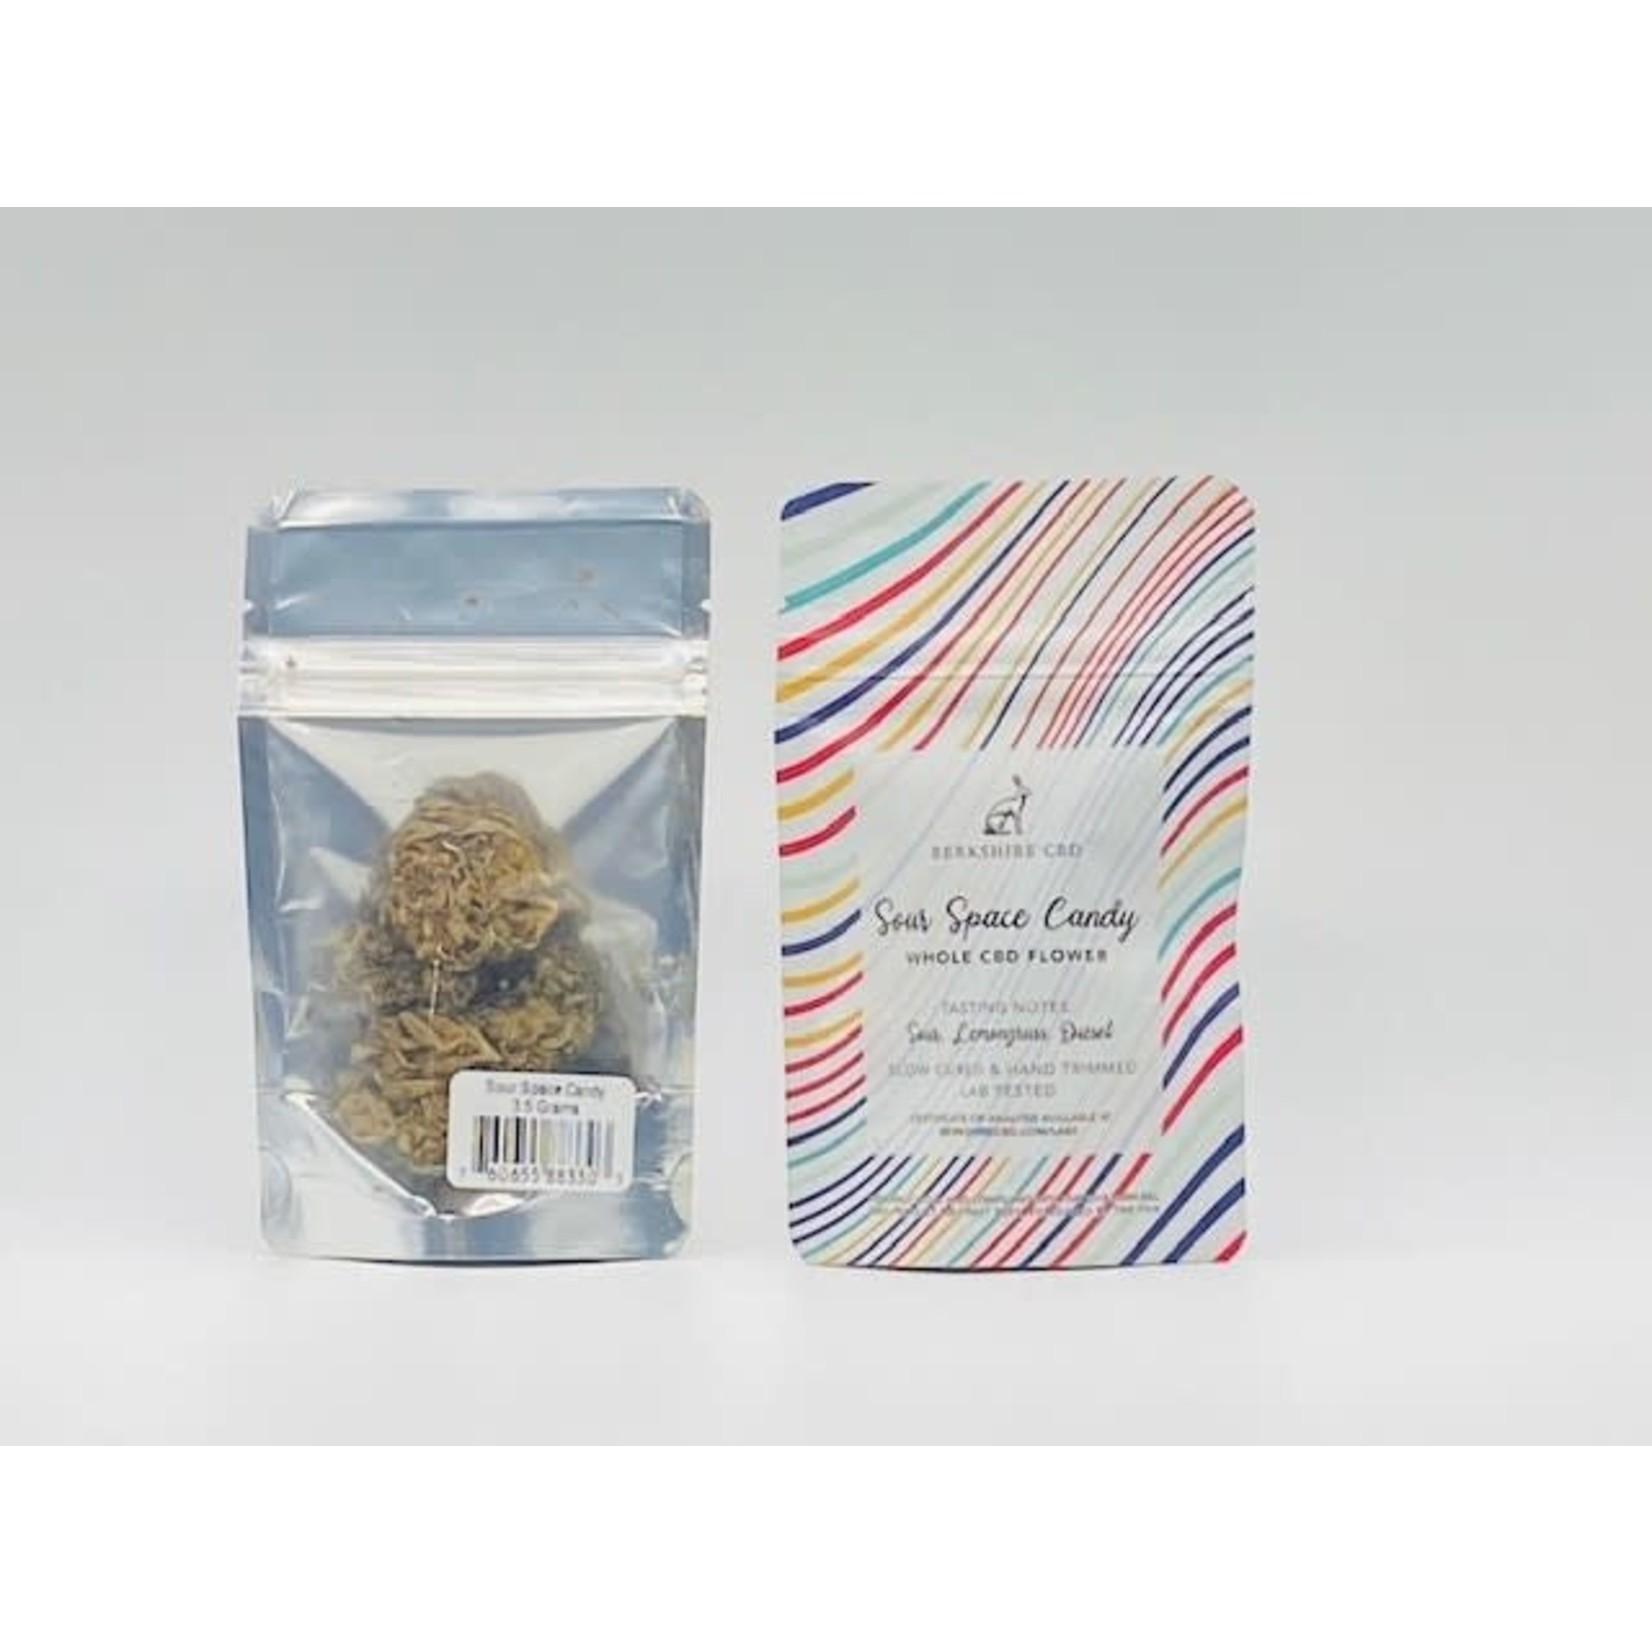 Berkshire CBD BKSH CBD Sour Space Candy Flower 3.5